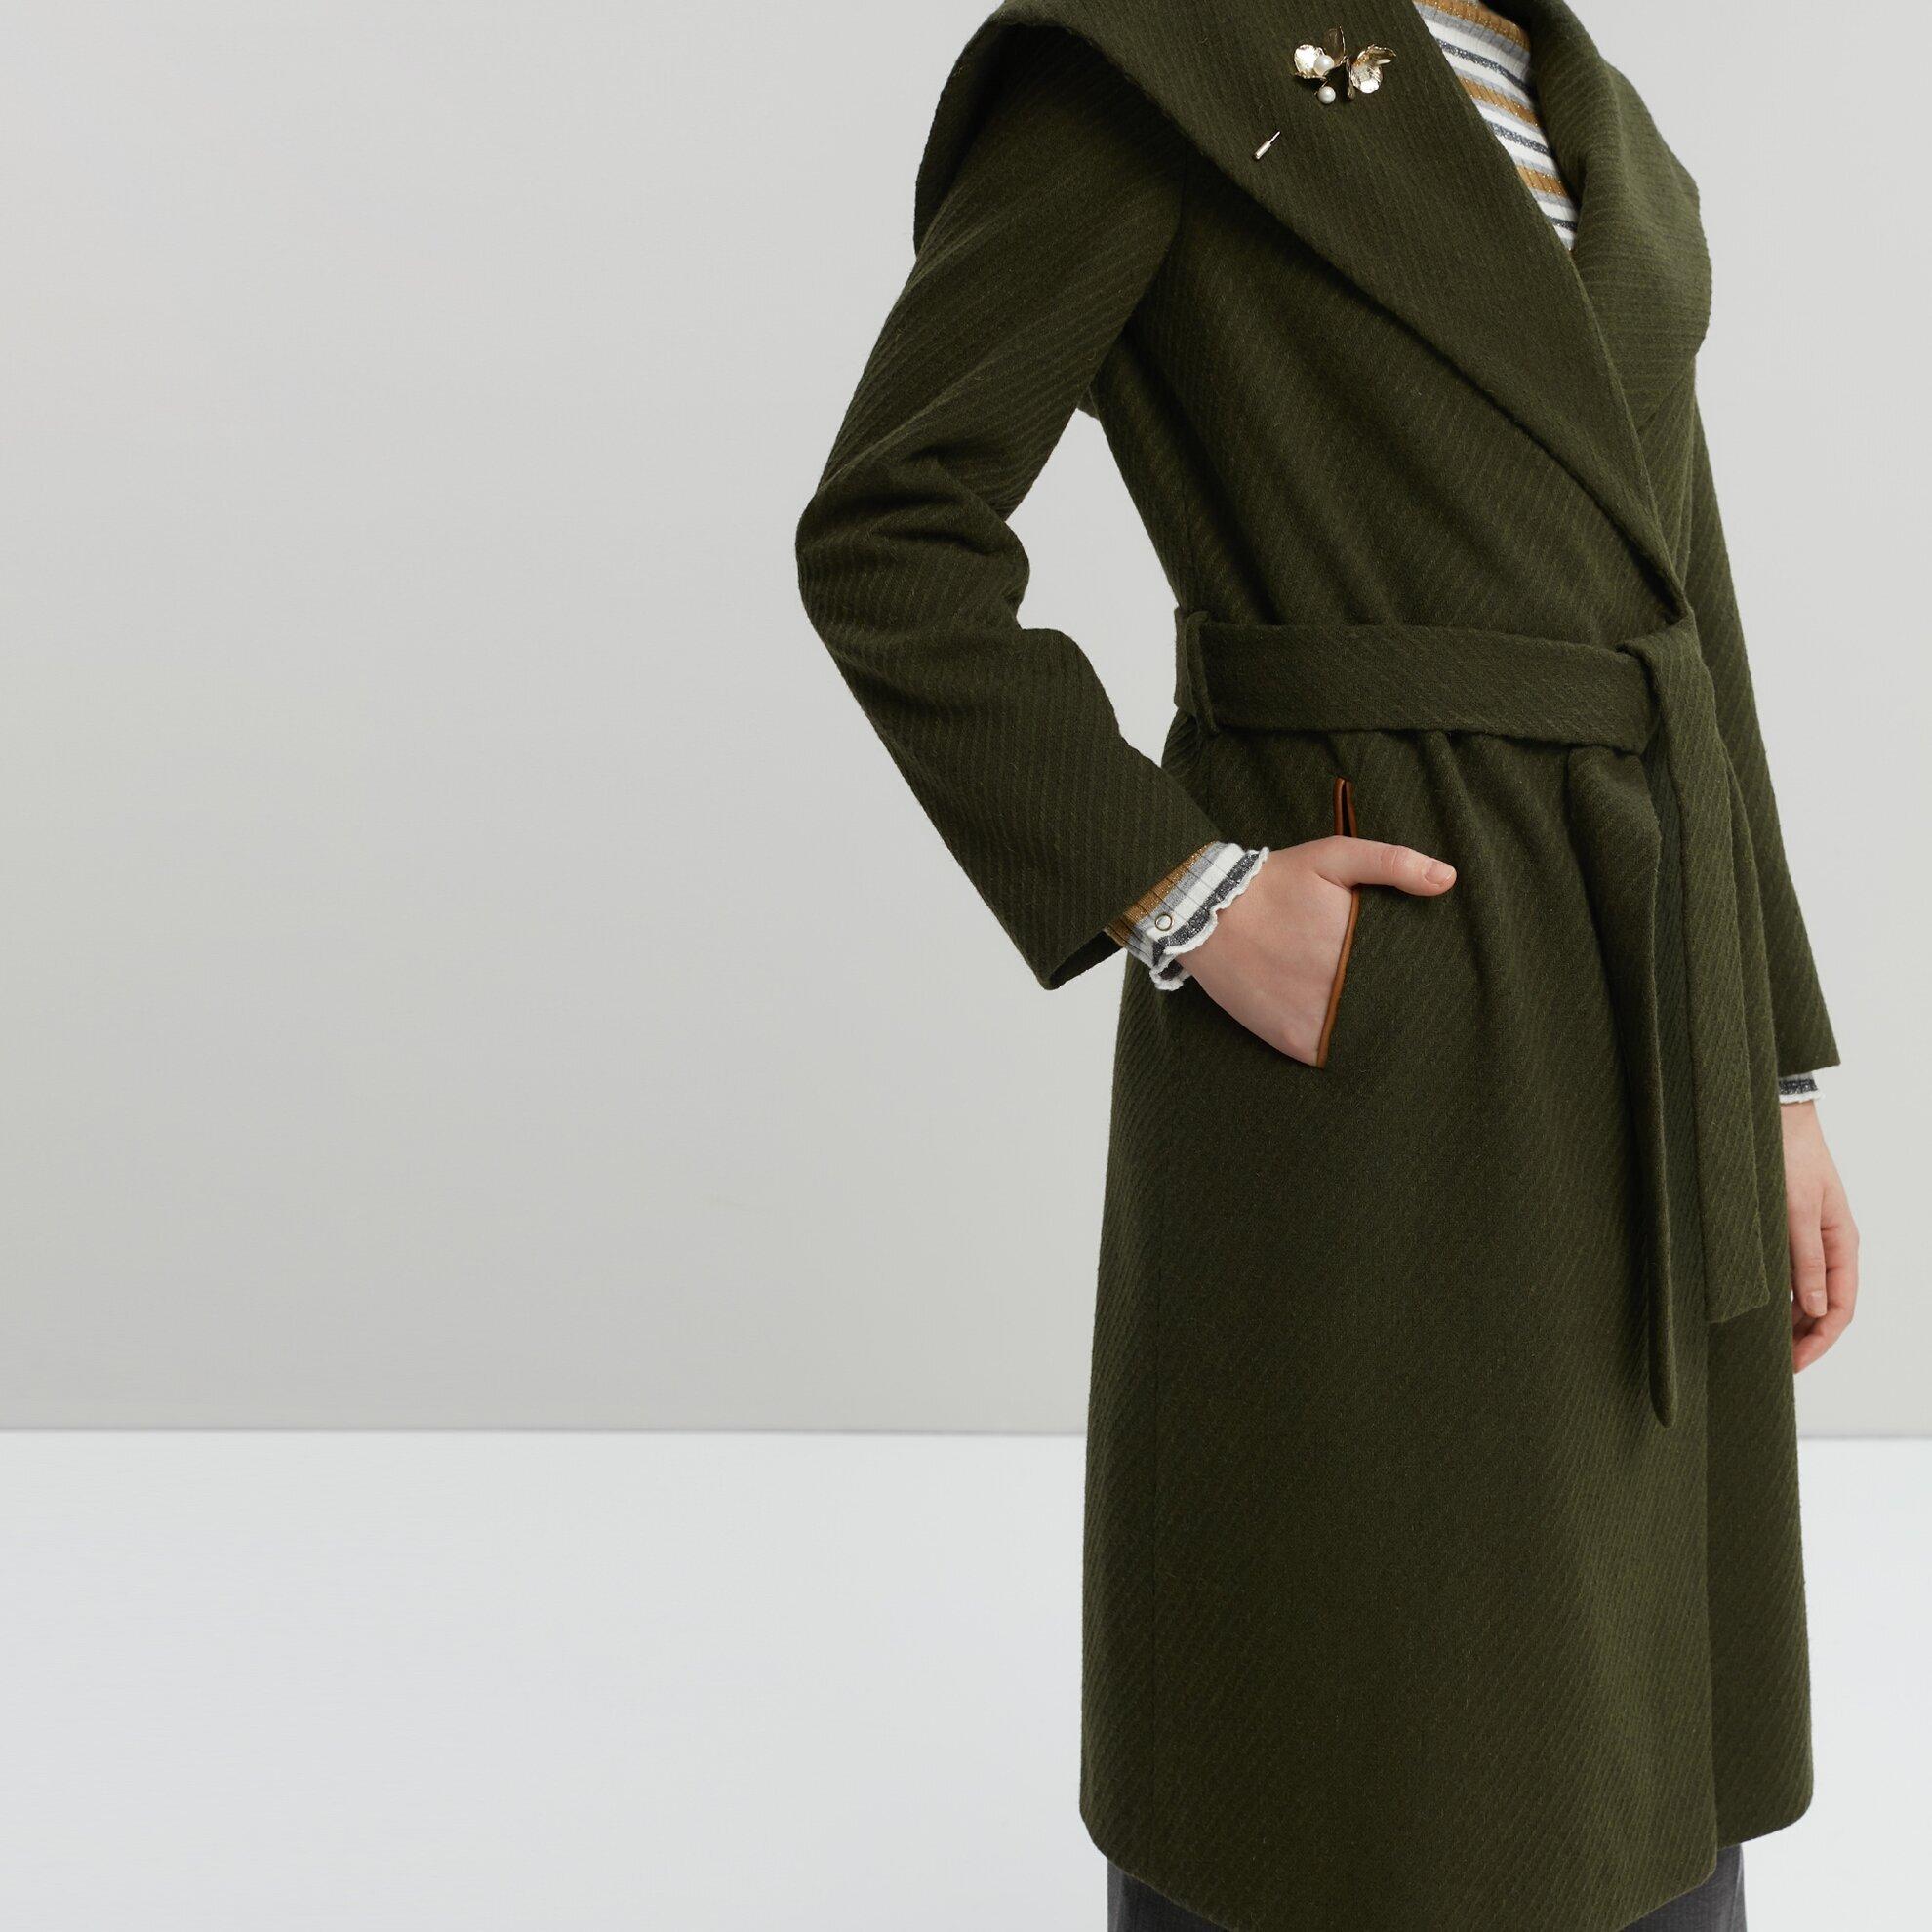 Kapüşonlu Uzun Palto